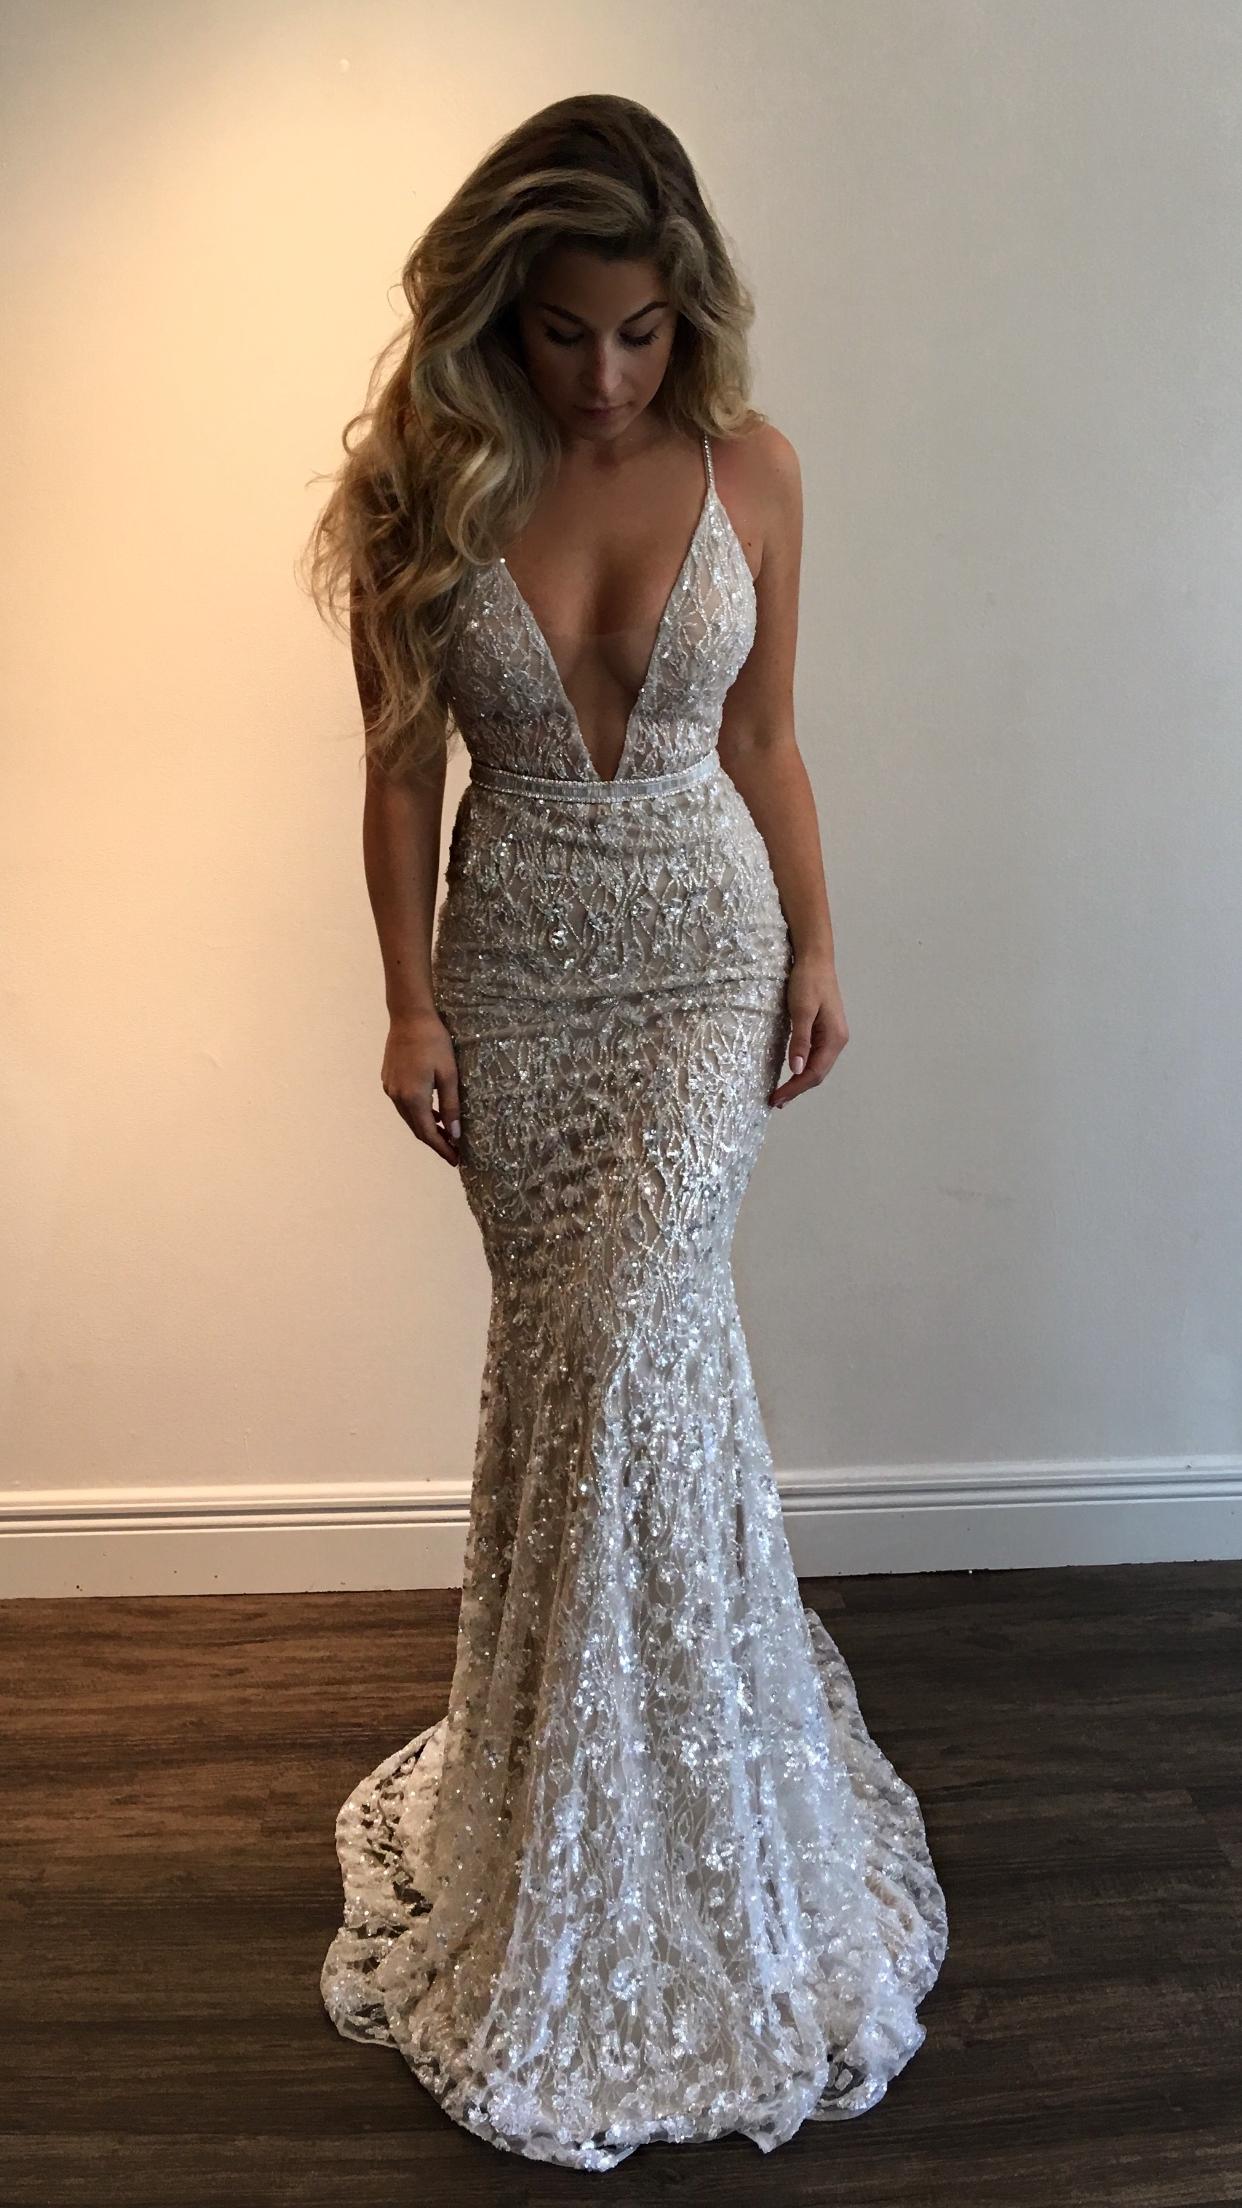 Coolste Abschlusskleider Lang Eng Vertrieb - Abendkleid